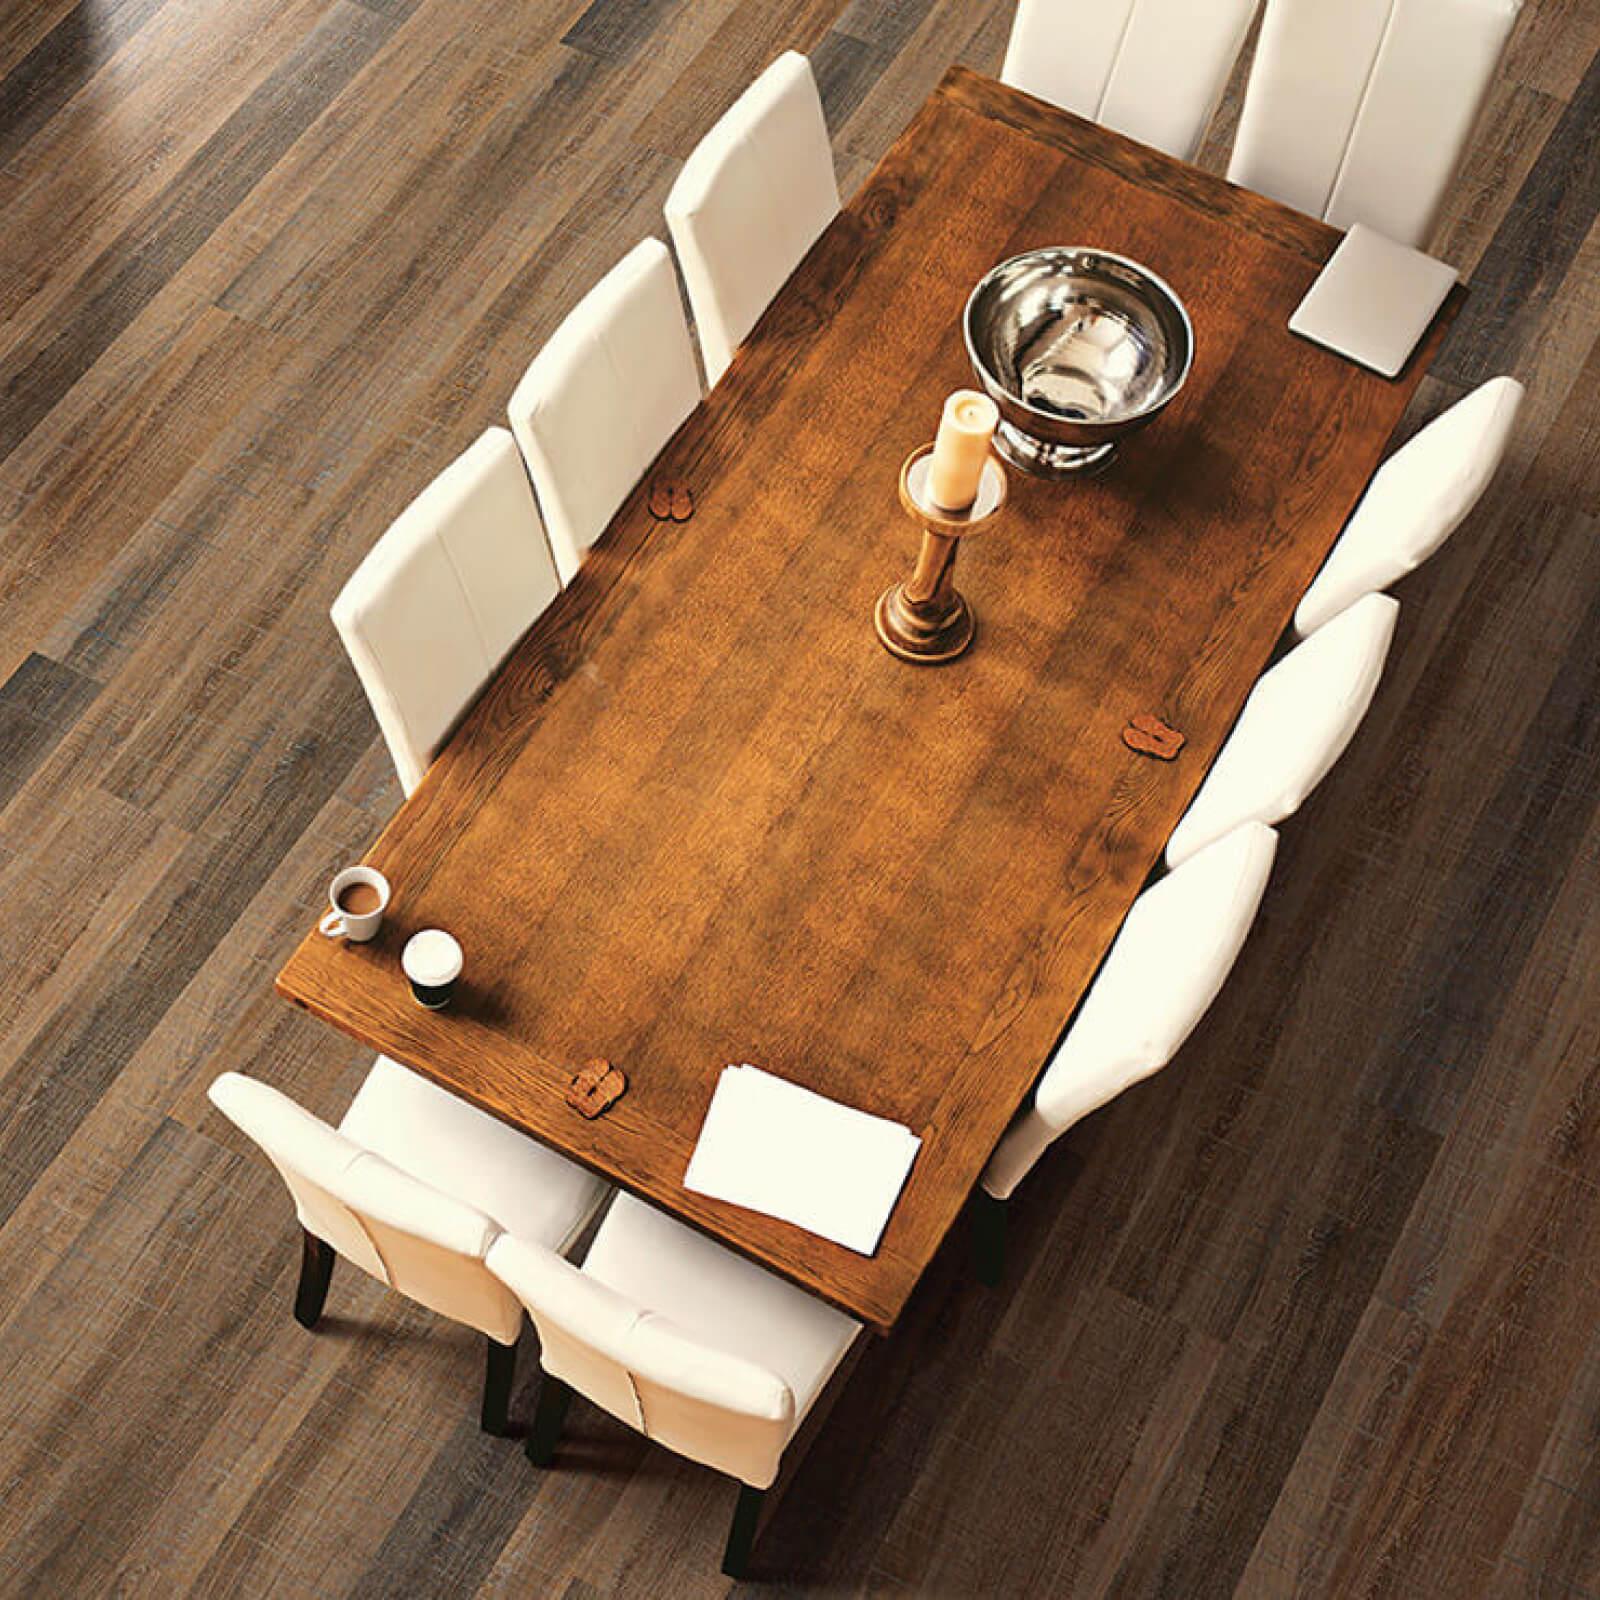 Dining room flooring | Great Floors